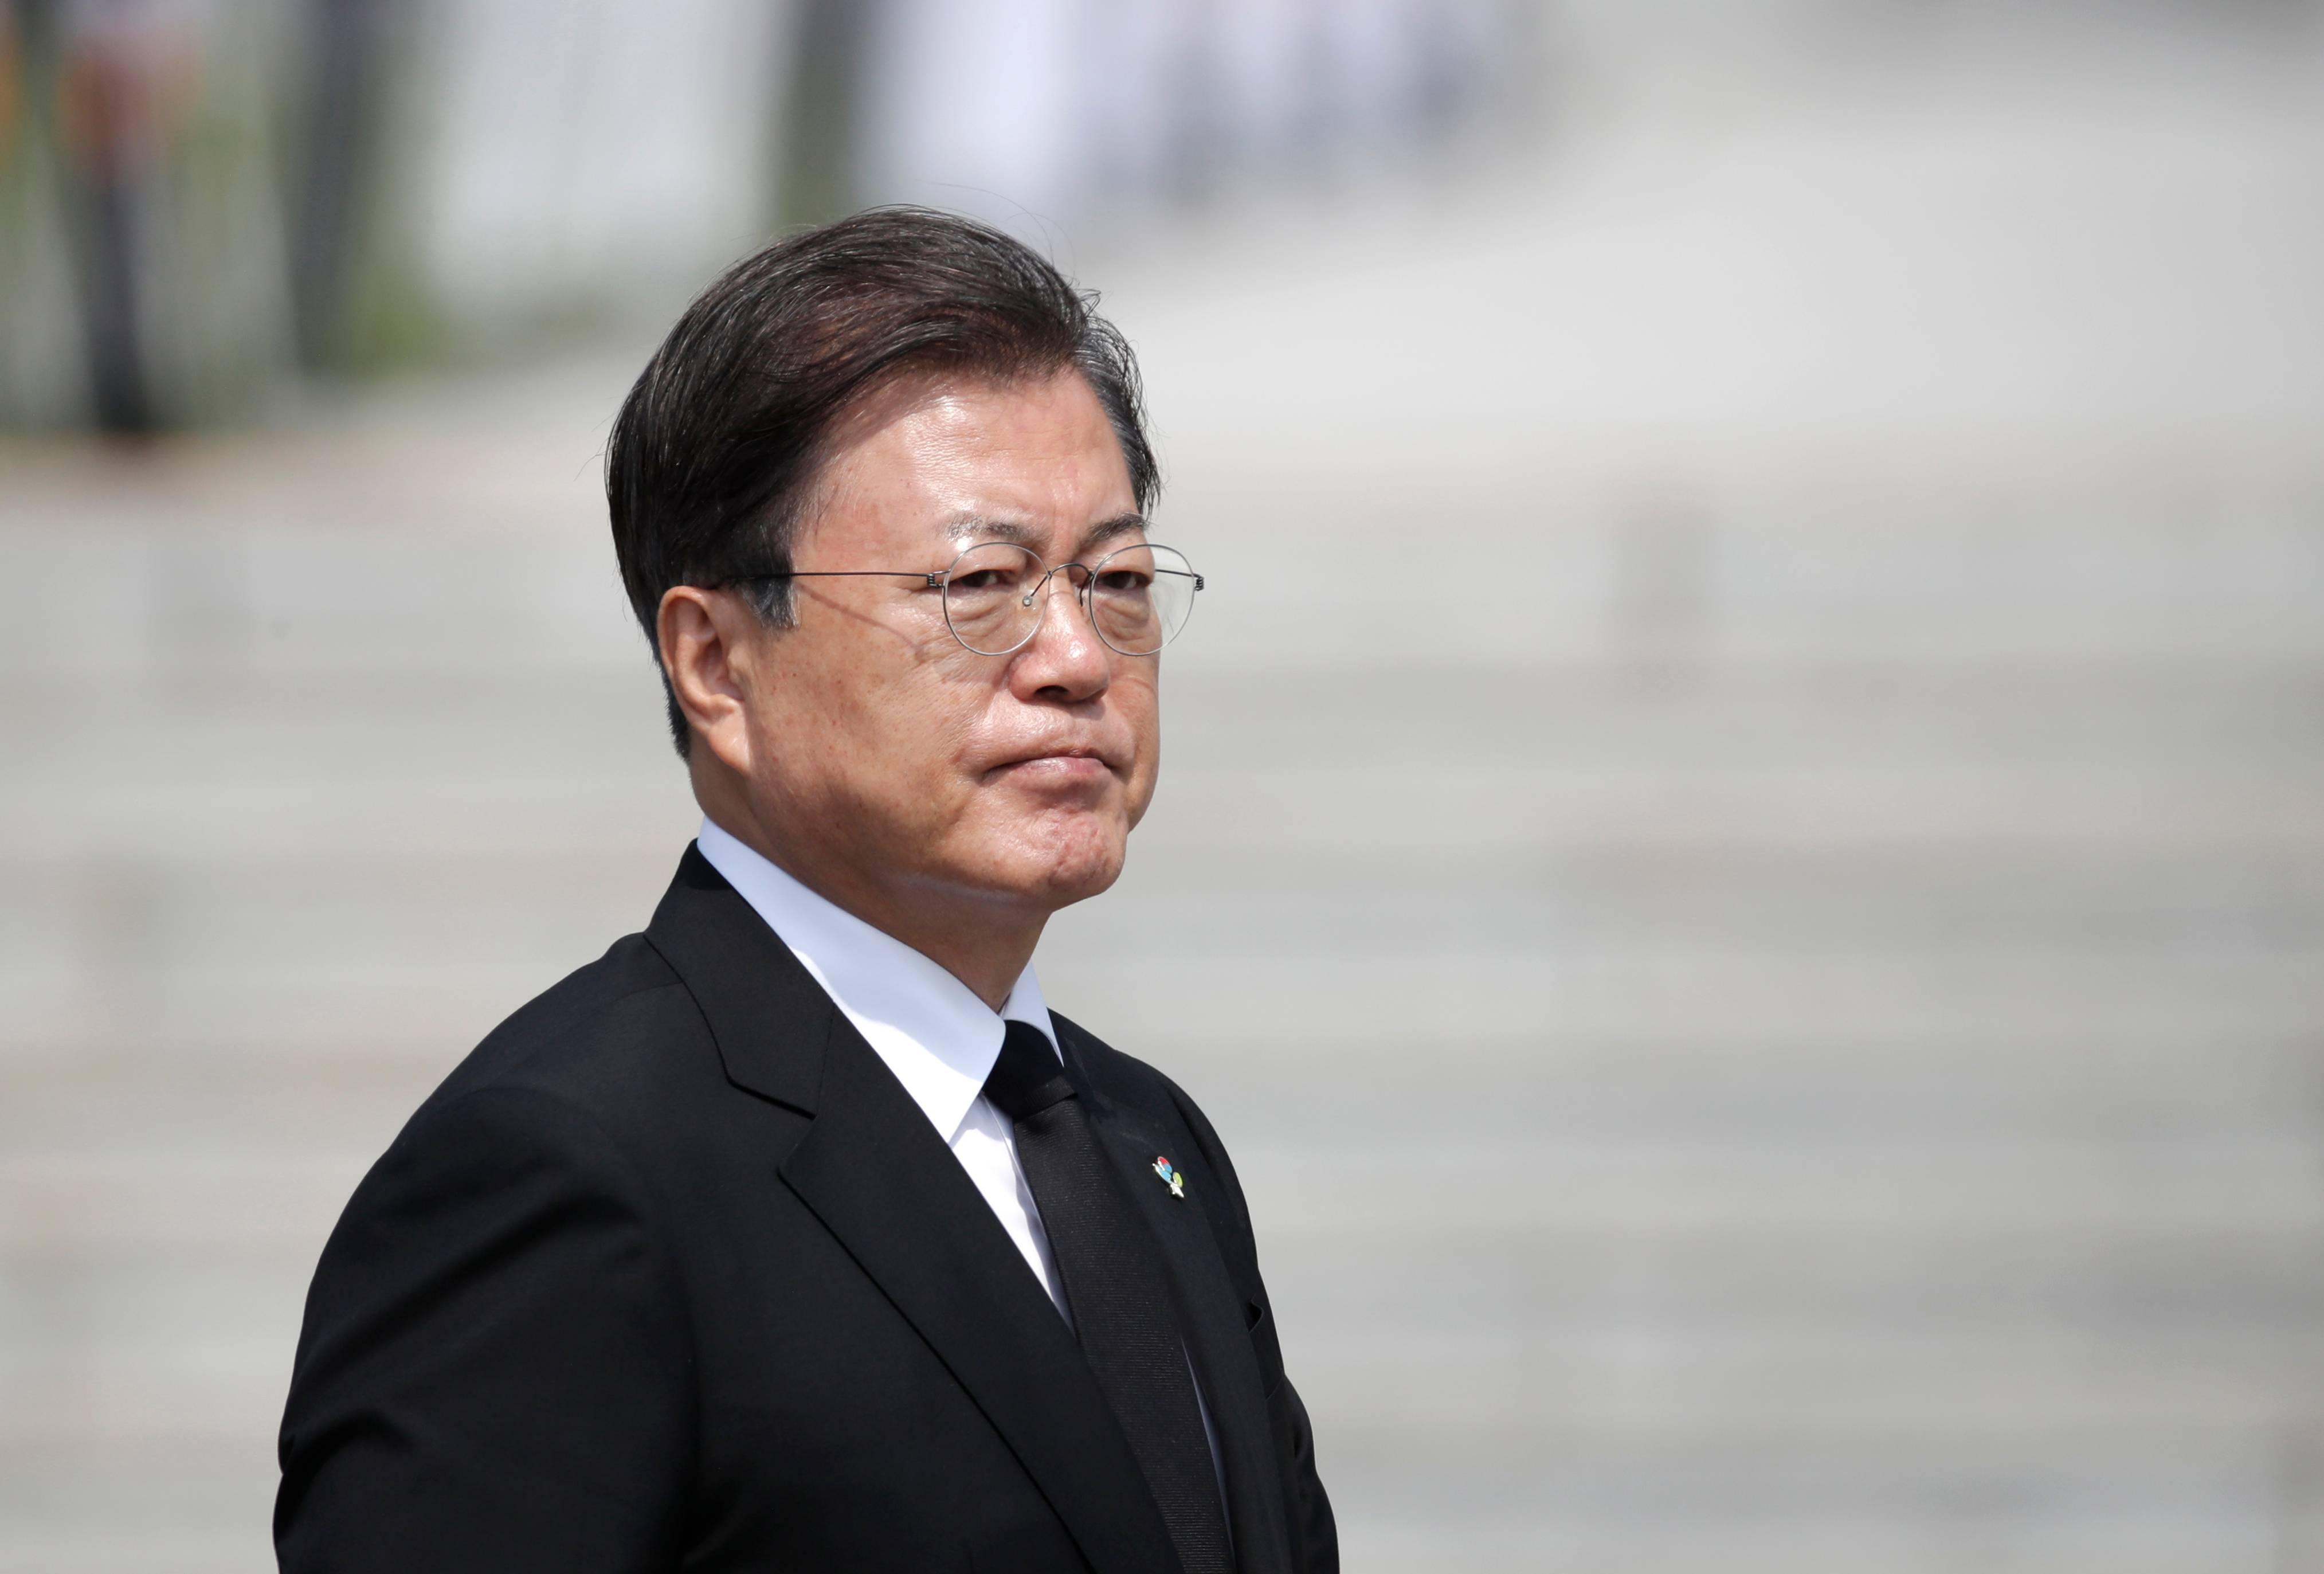 Presidente da Coreia do Sul, Moon Jae-in   FOTO: Lee Jin-man / POOL / AFP